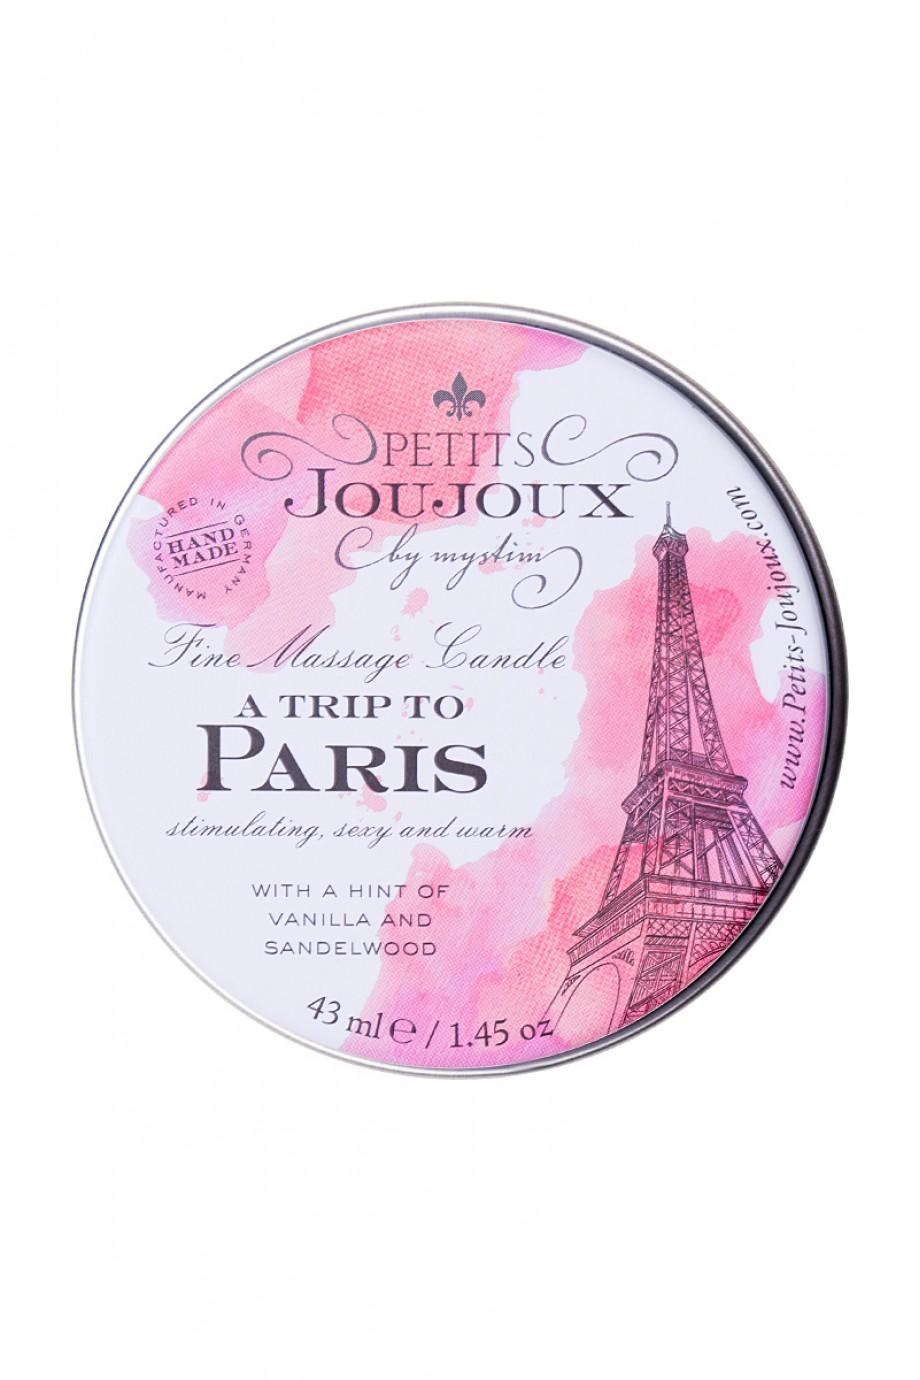 Массажная свеча Petits JouJoux Mini Paris с ароматом ванили и сандалового дерева, 43 мл